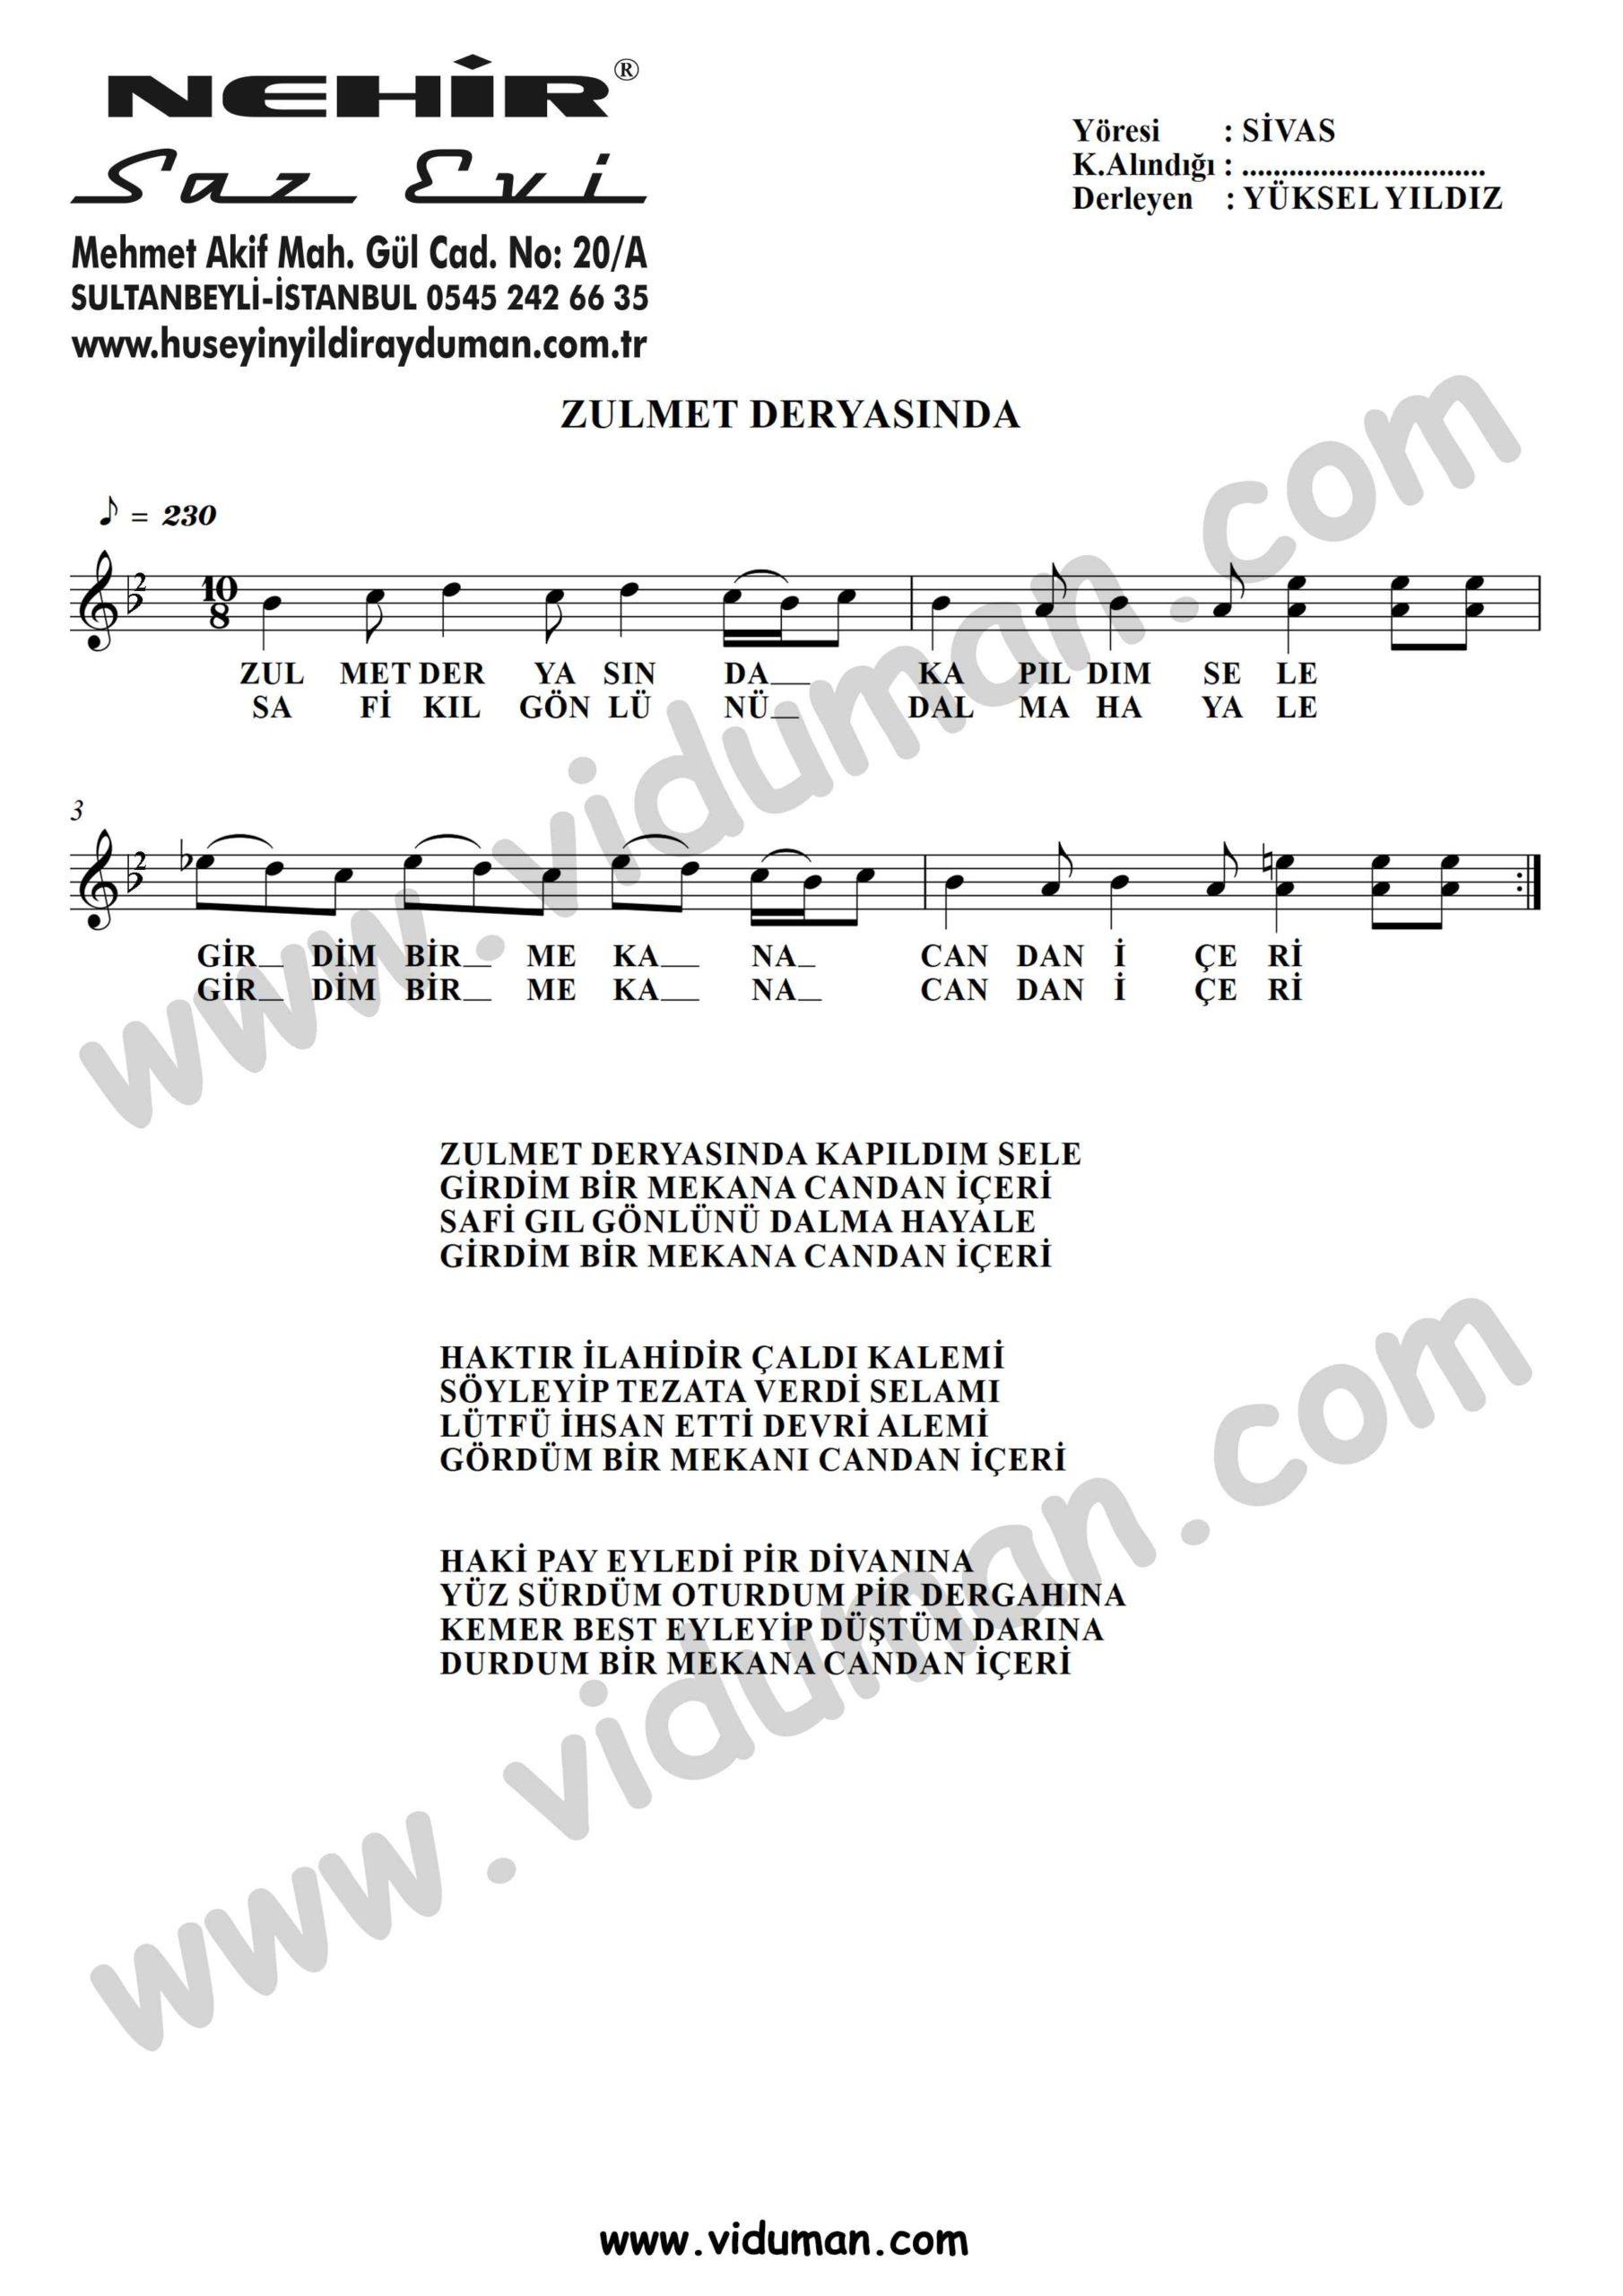 Zulmet Deryasinda-Baglama-Saz-Turku-Notalari